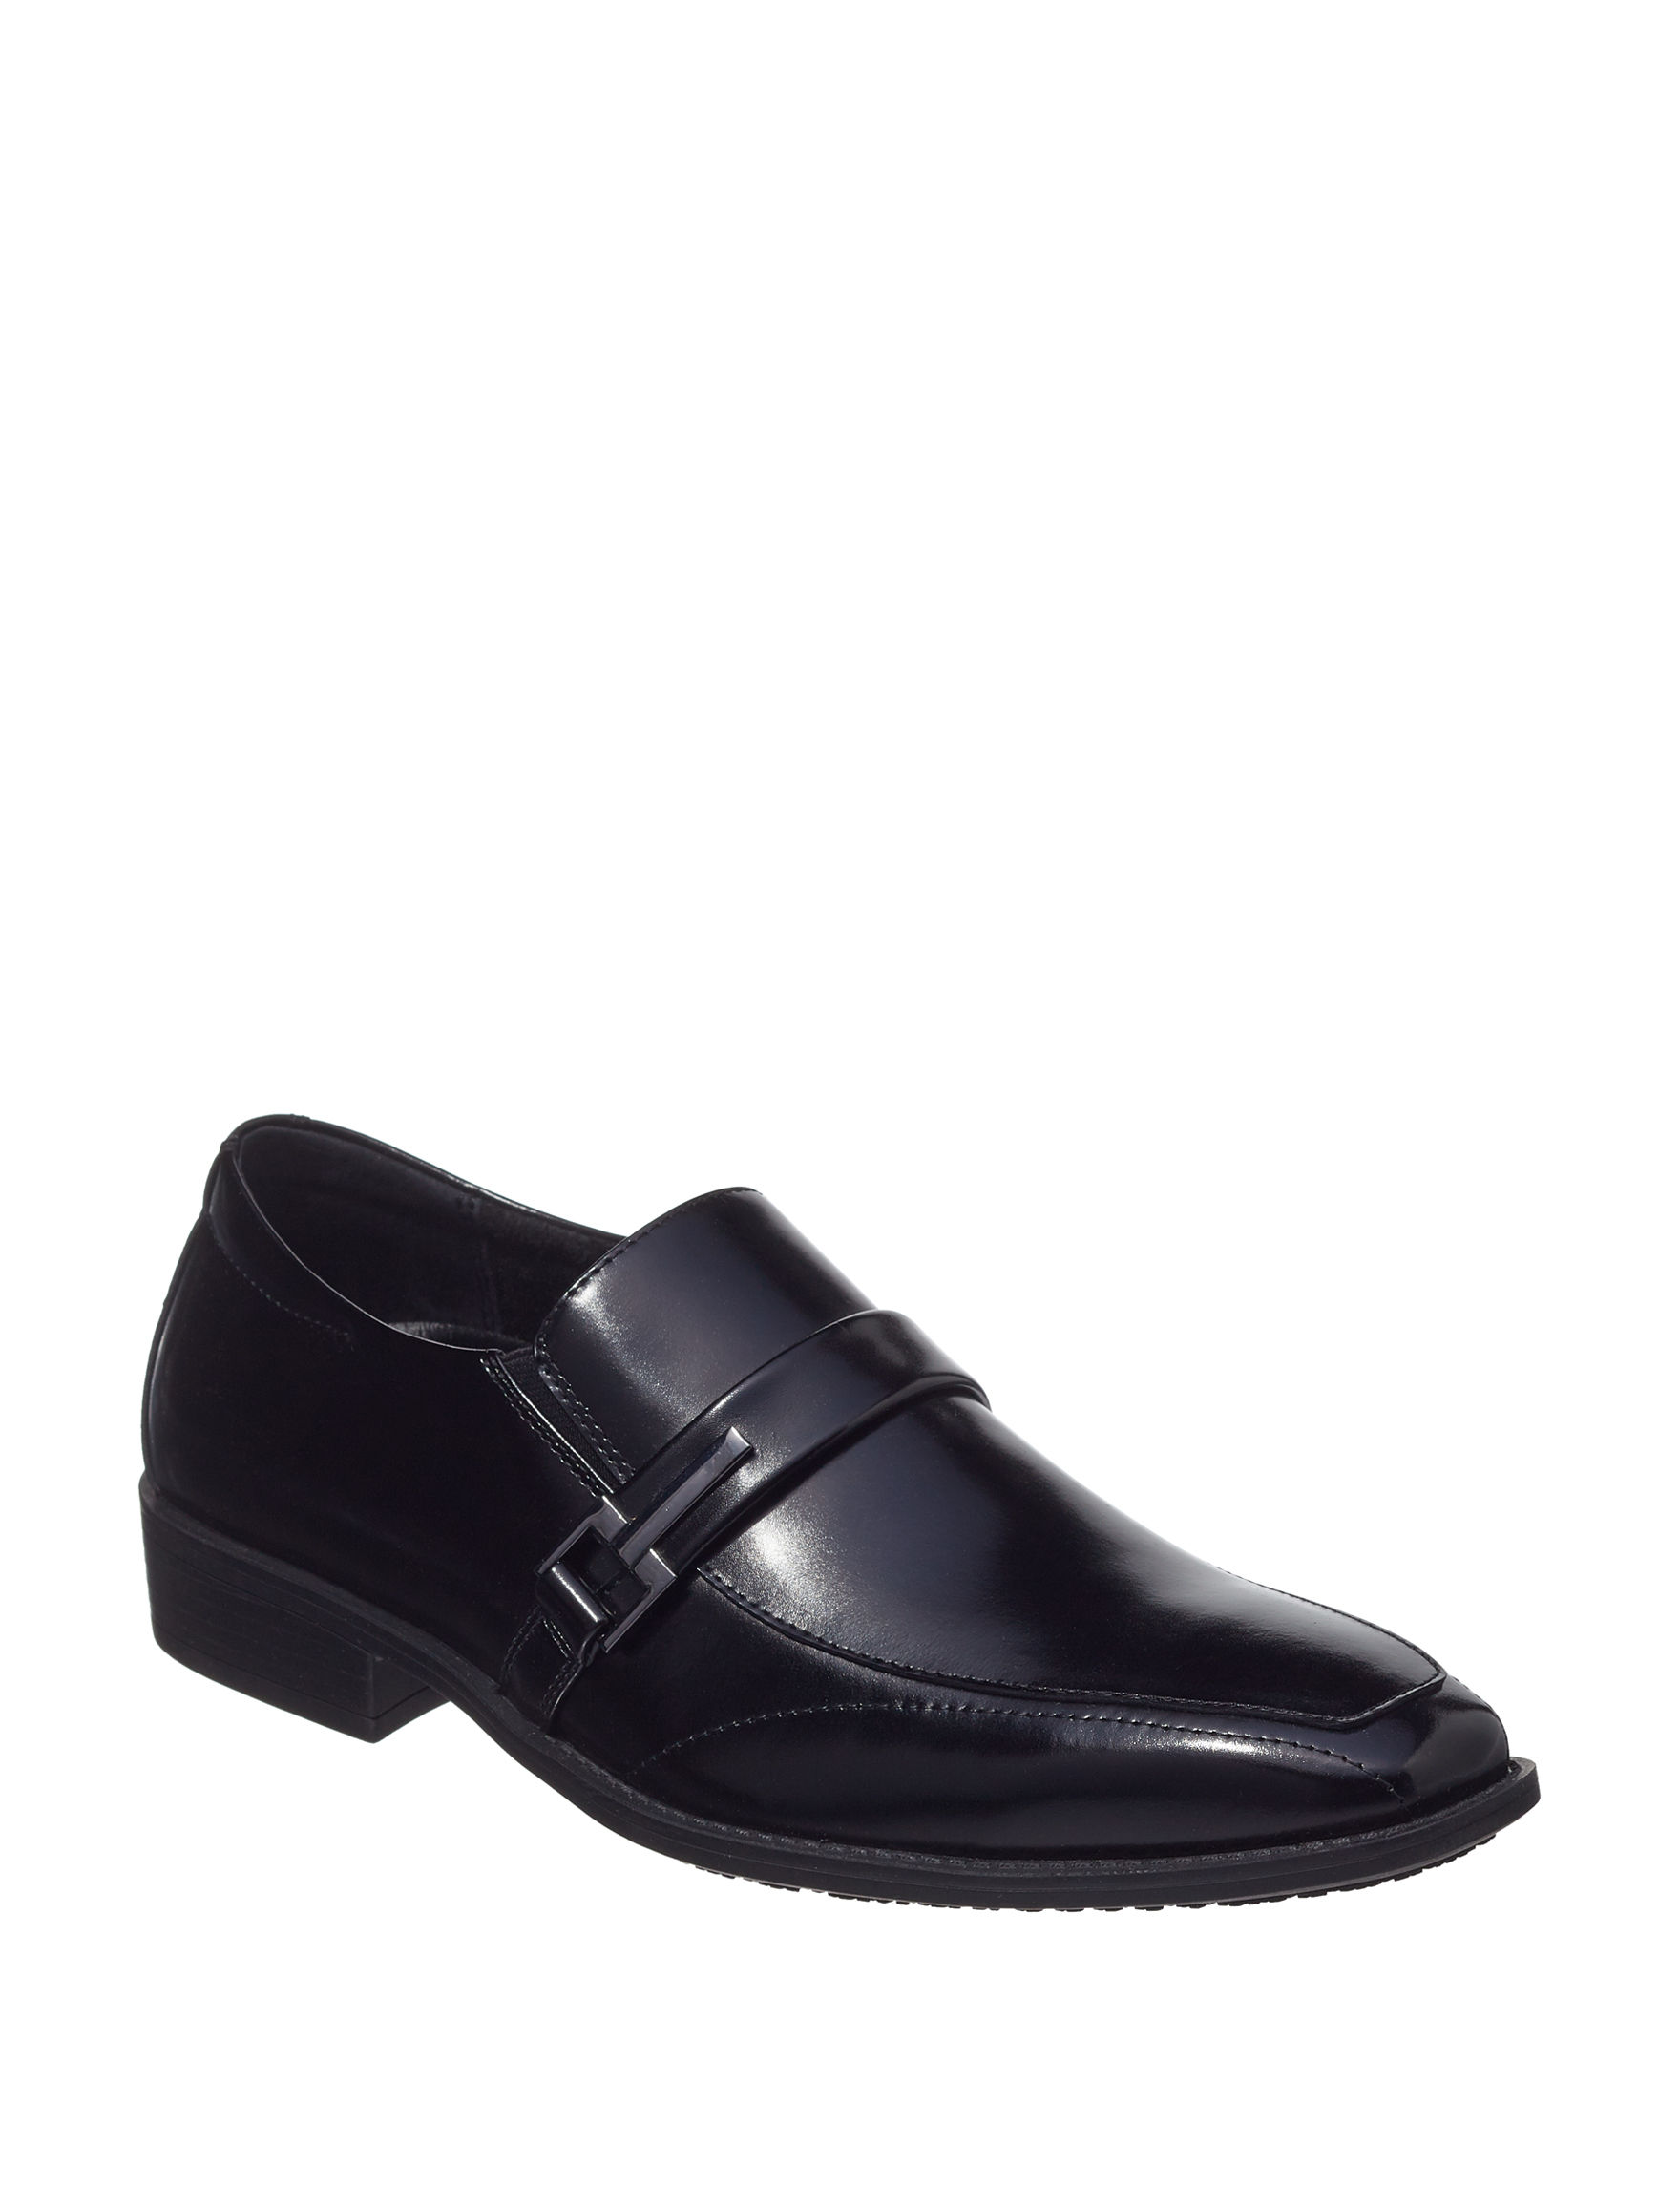 Stacy Adams Black Slip Resistant